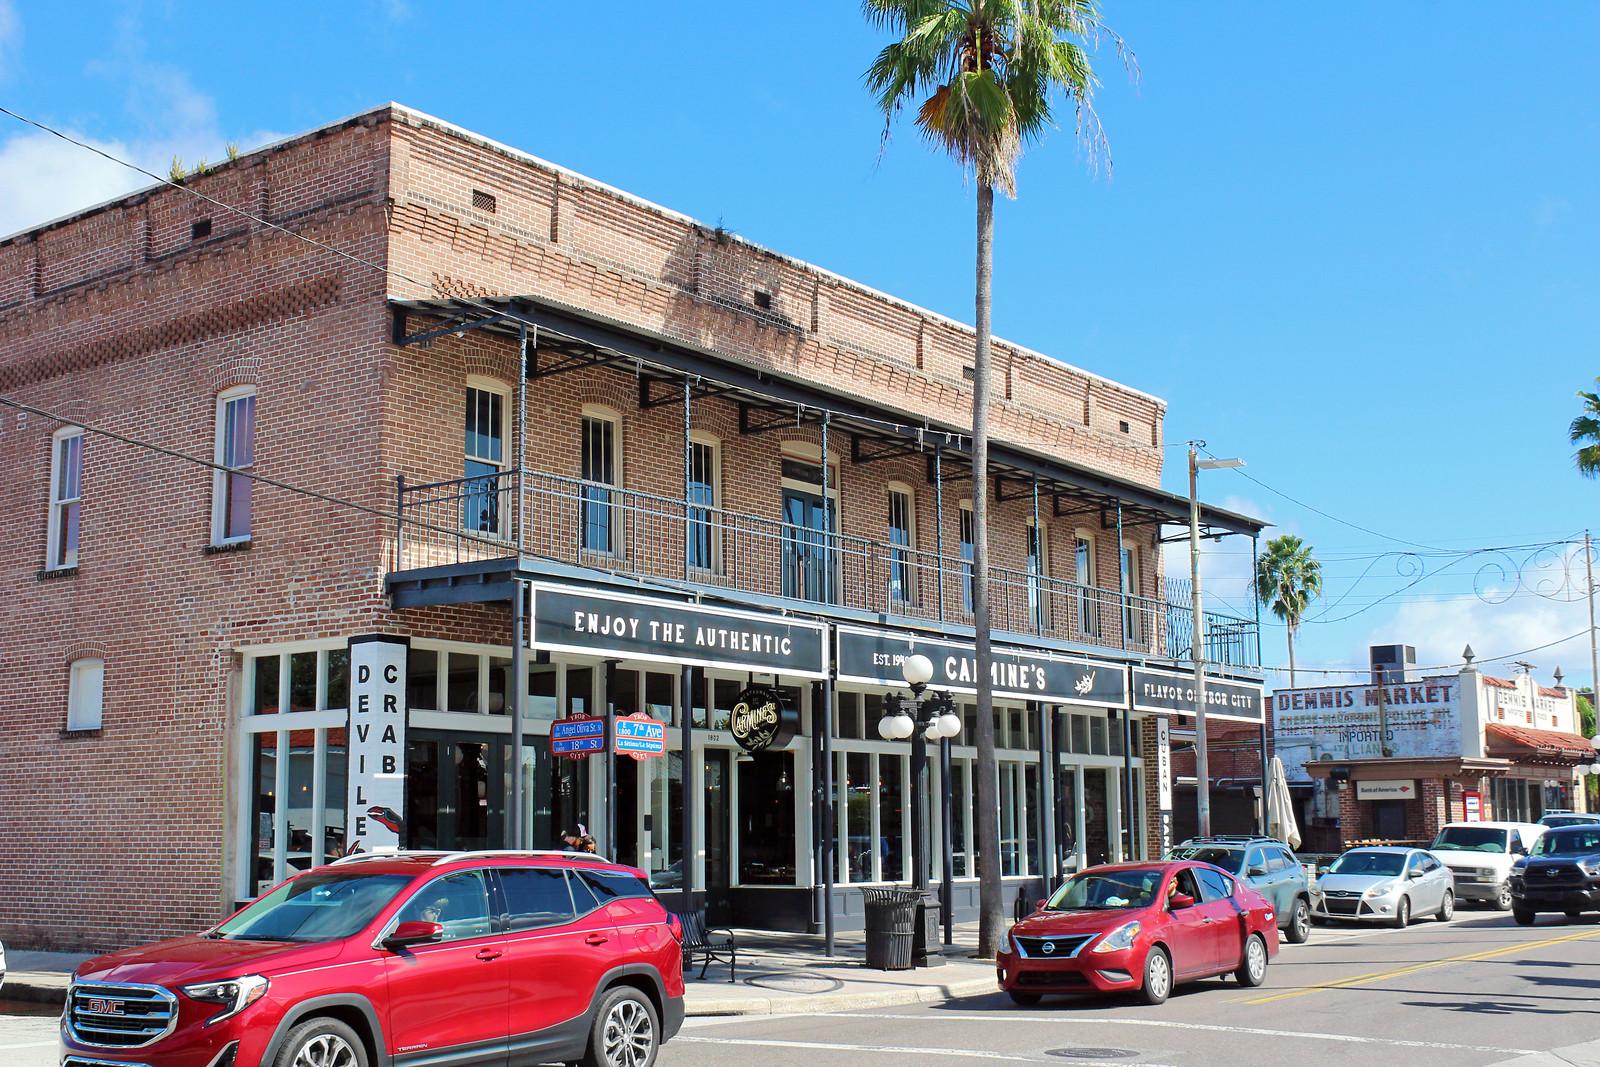 Carmine's Restaurant, Ybor City, Tampa